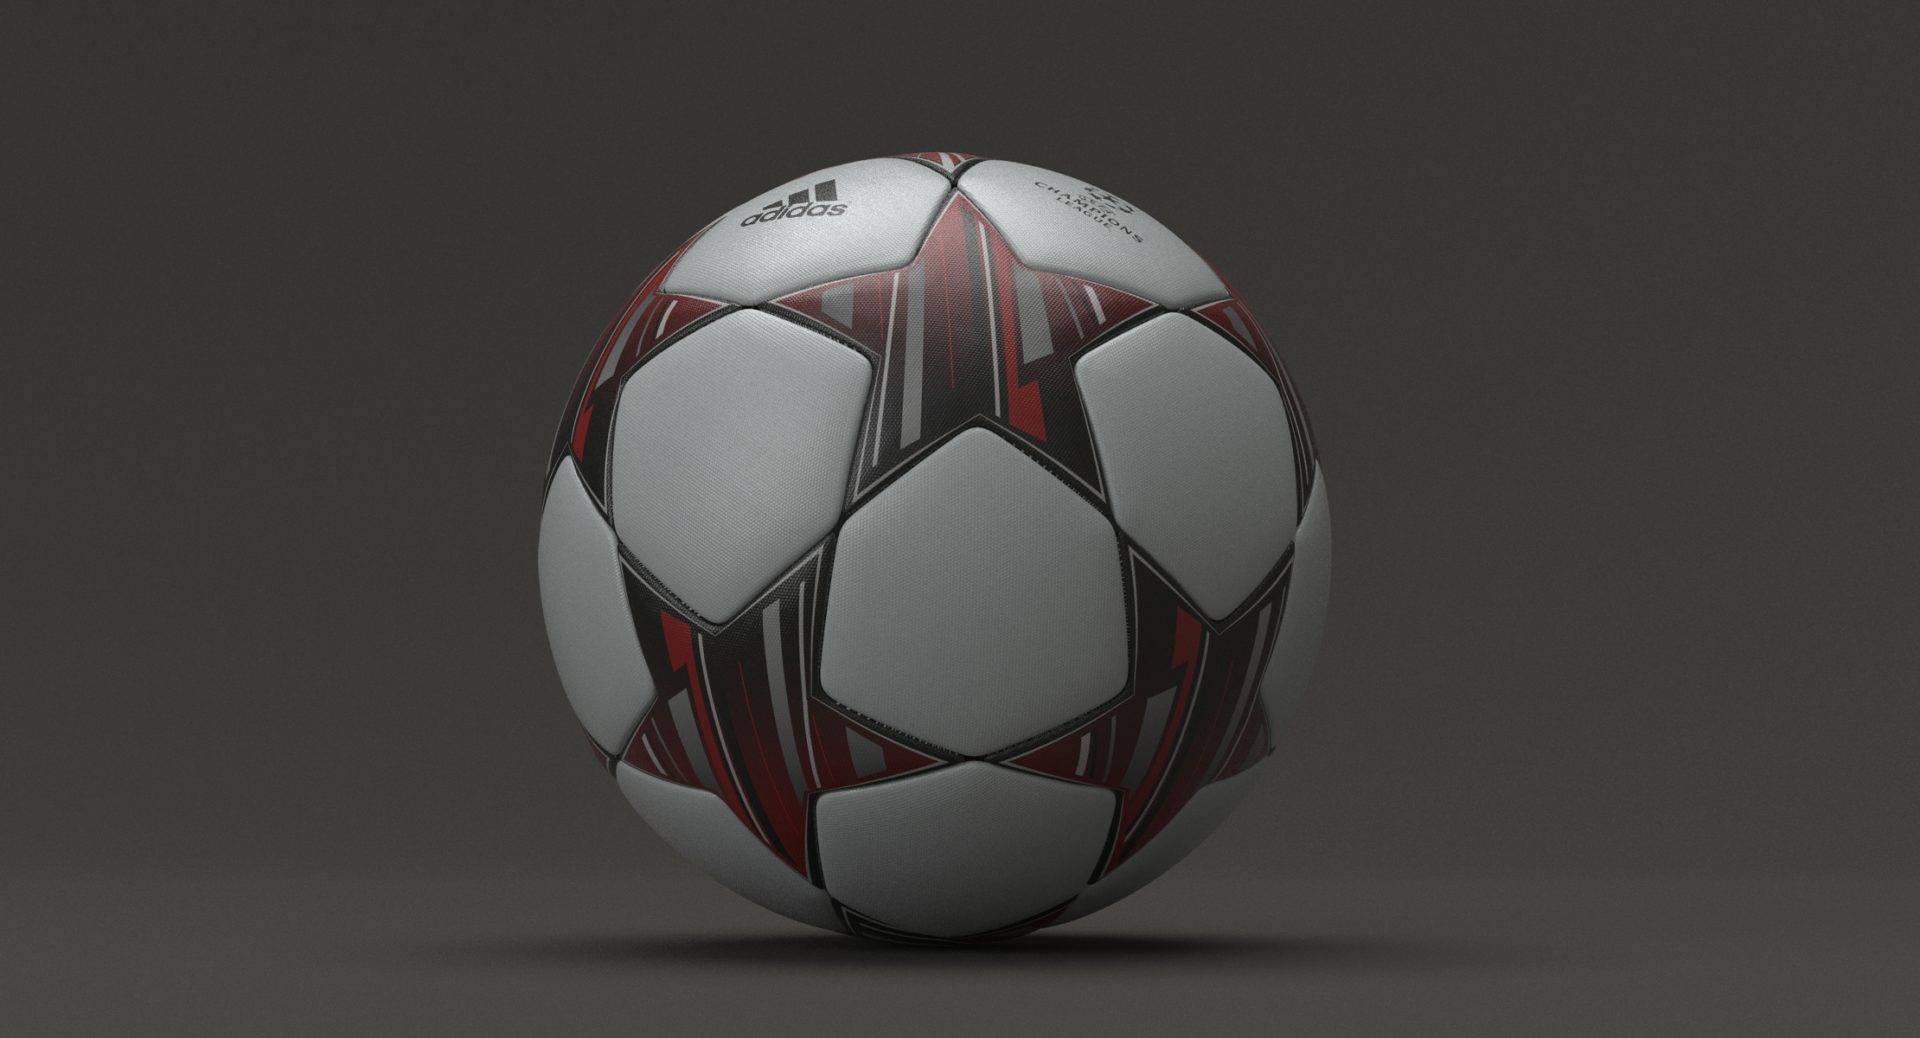 Adidas Finale Soccer Ball